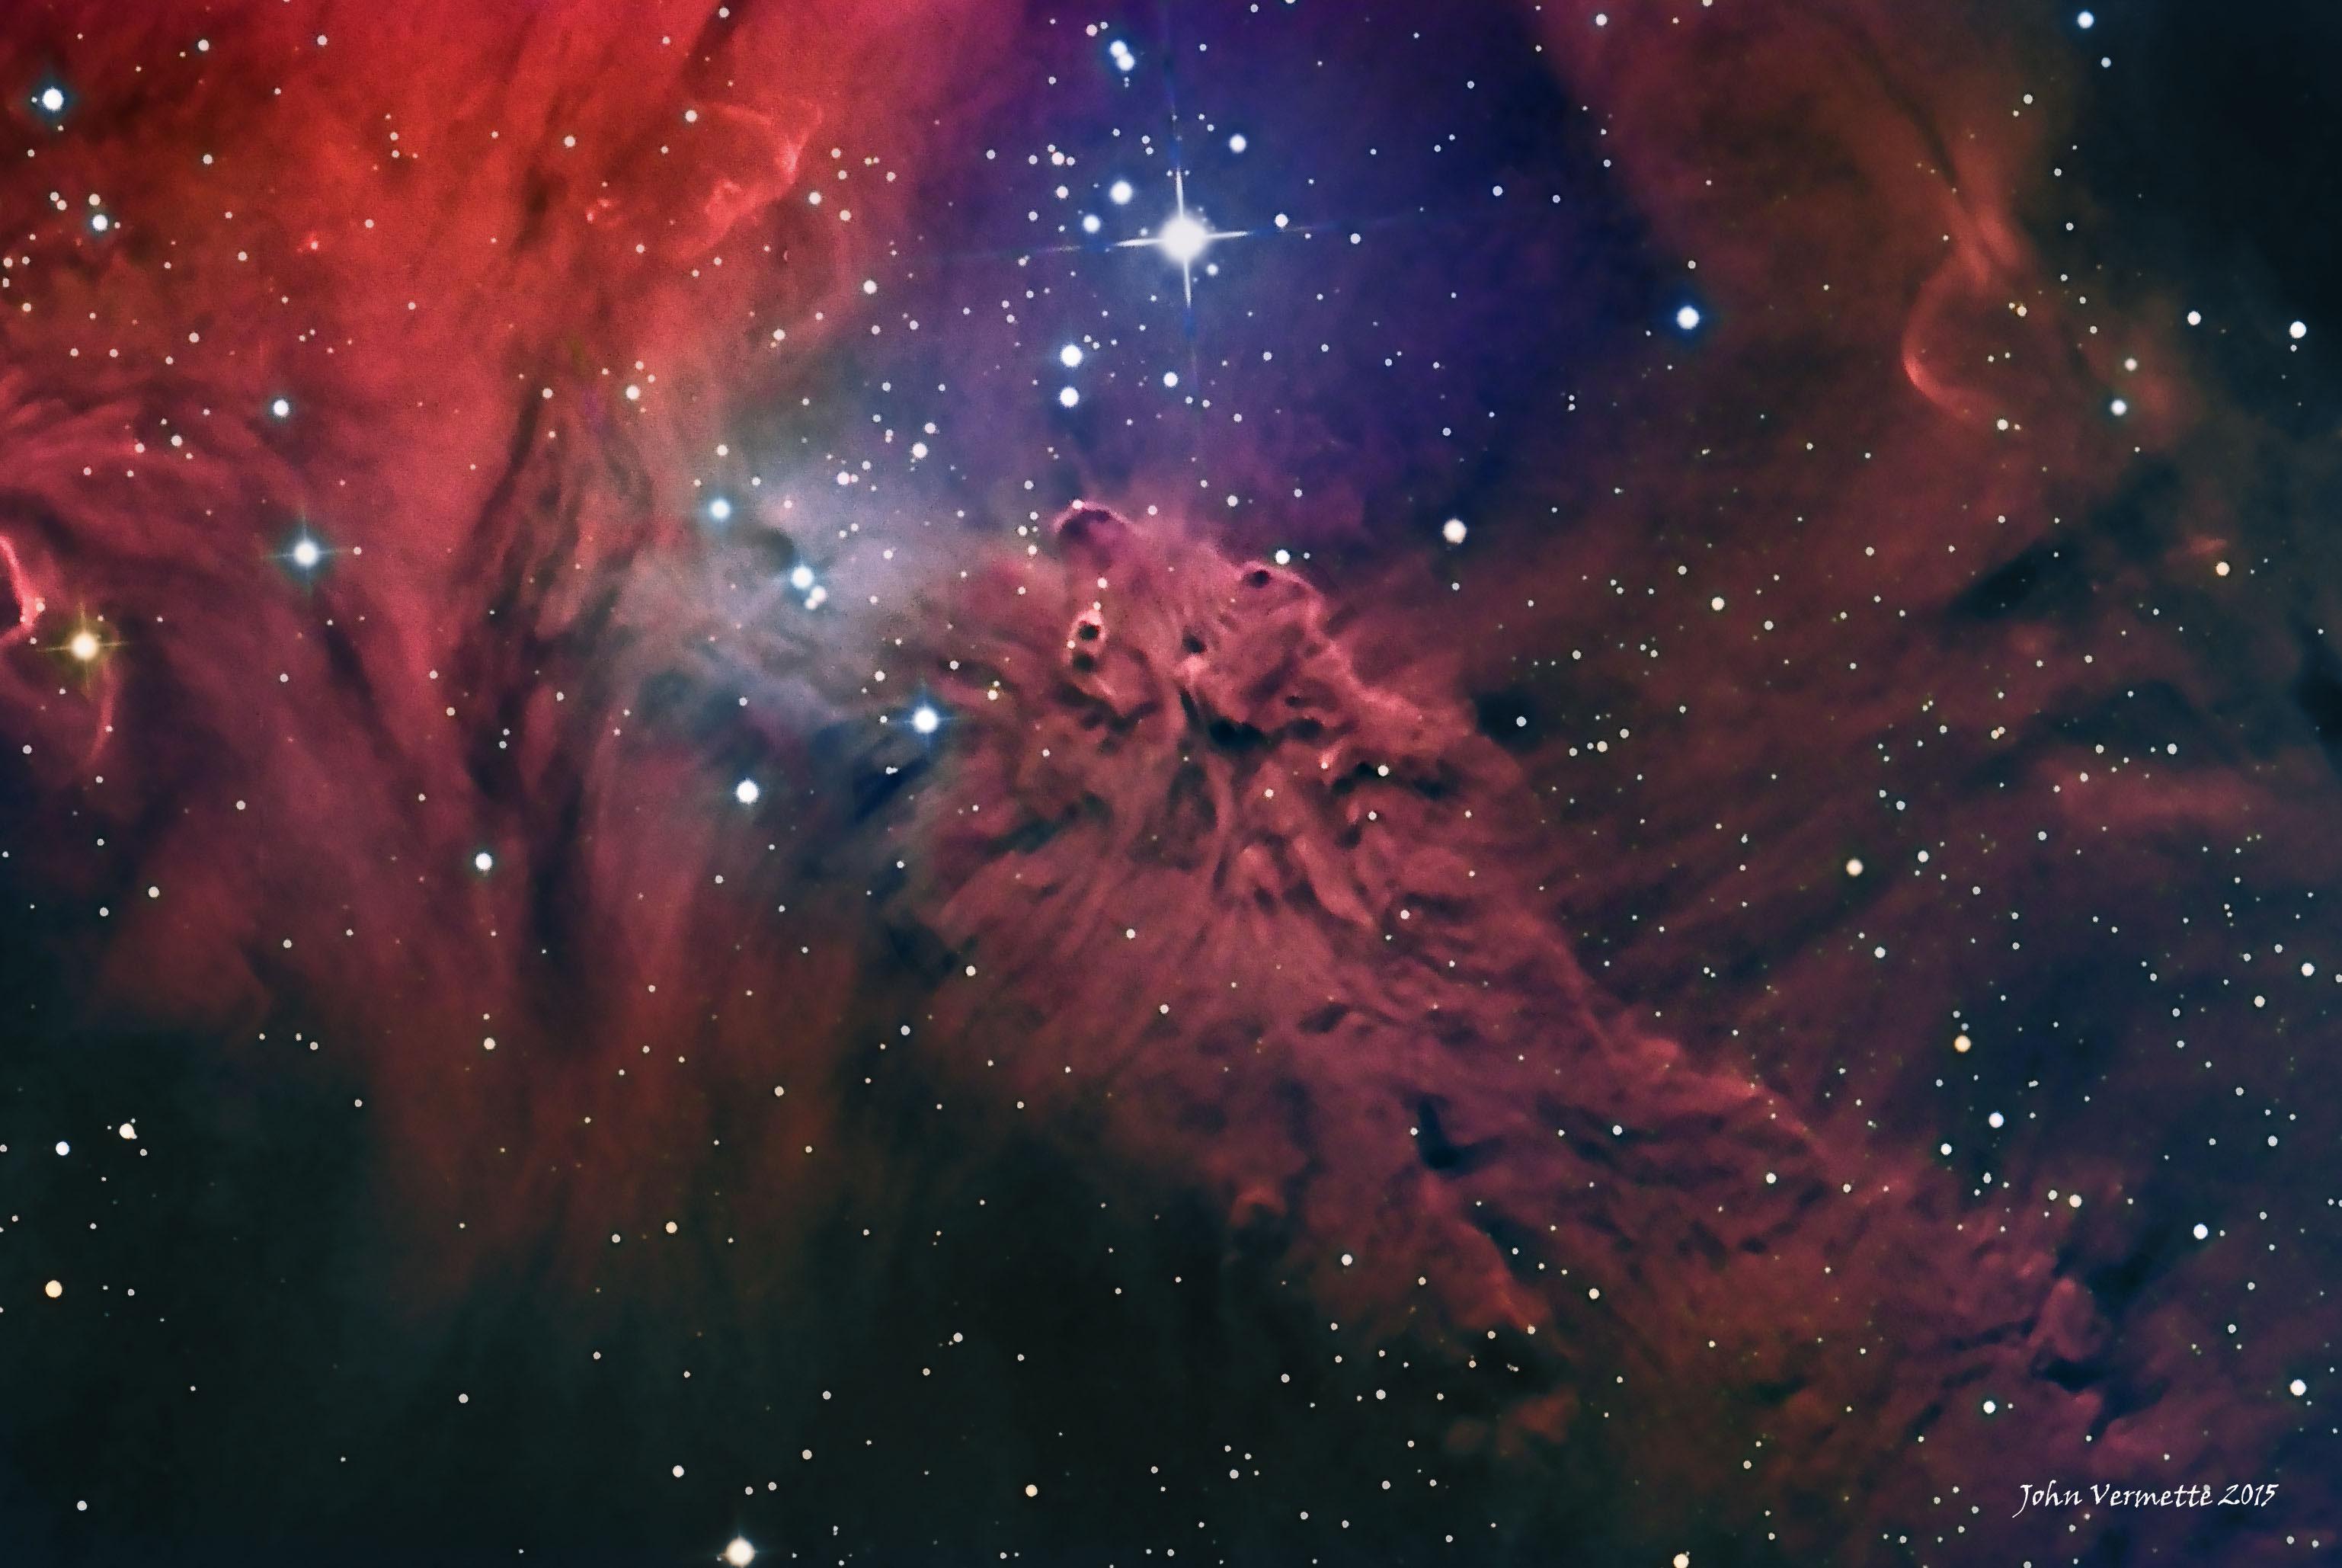 APOD: 2015 December 30 - The Fox Fur Nebula